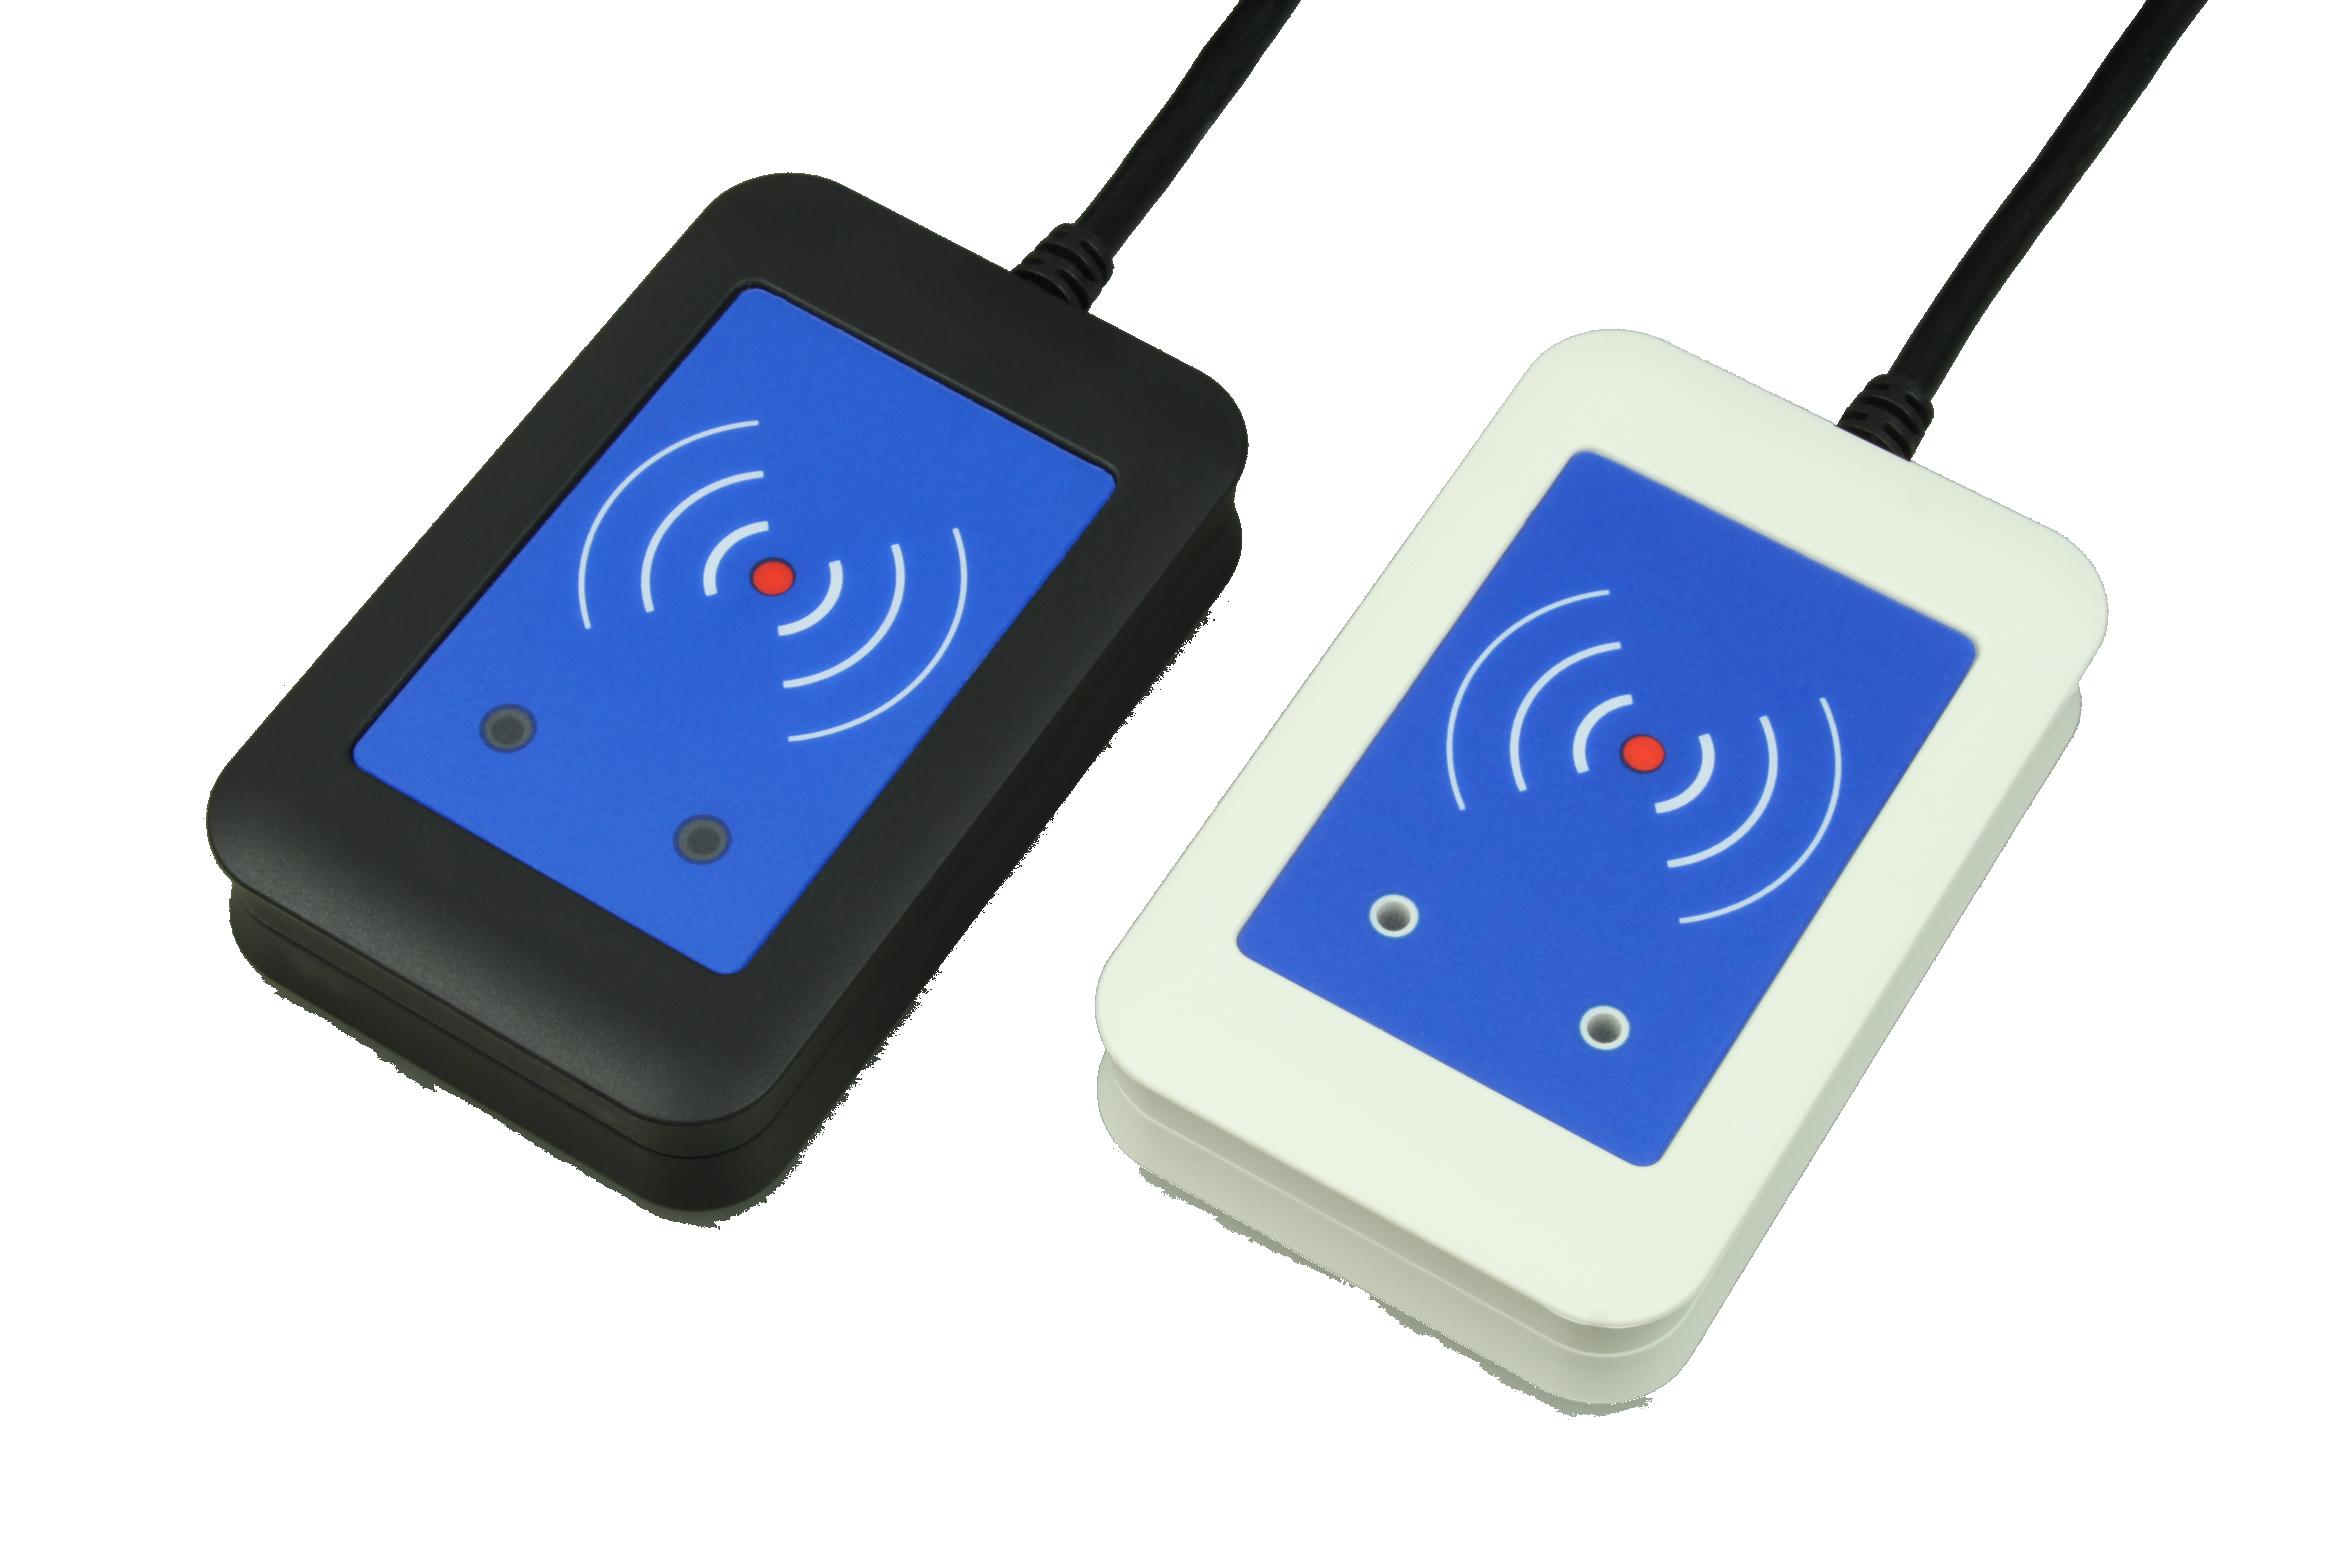 Elatec S Twn4 Multitech Reader Demystifies Rfid Card